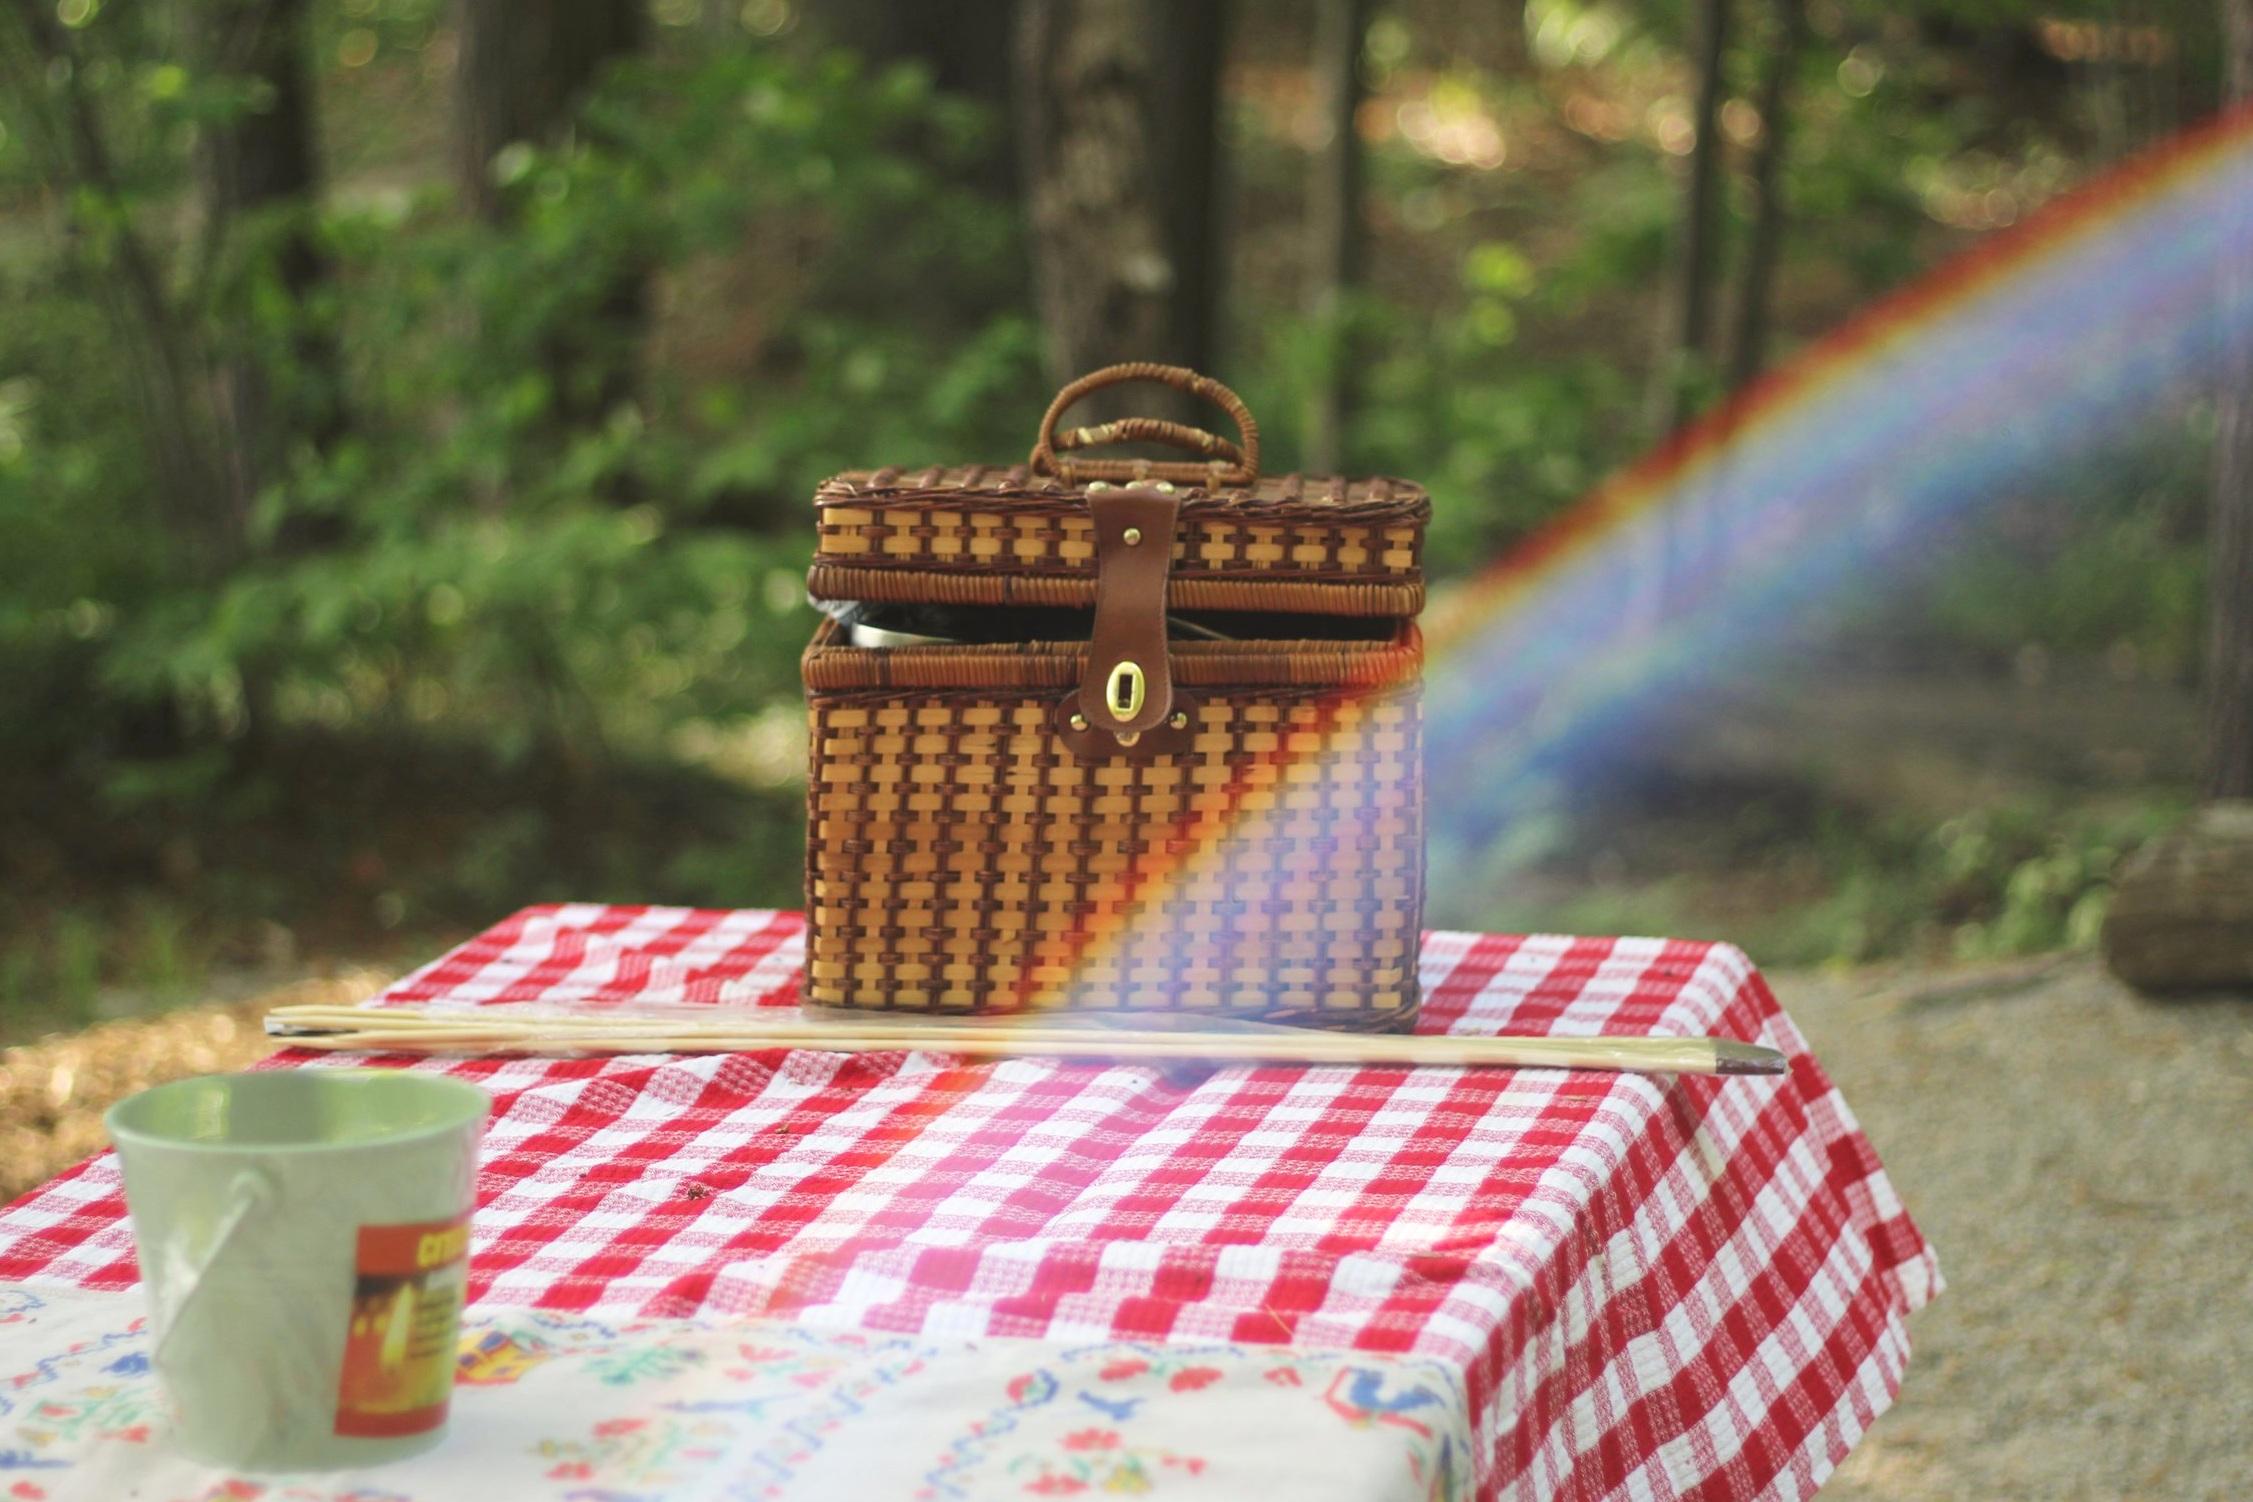 picnic-bonnie-kittle-98586-unsplash.jpg